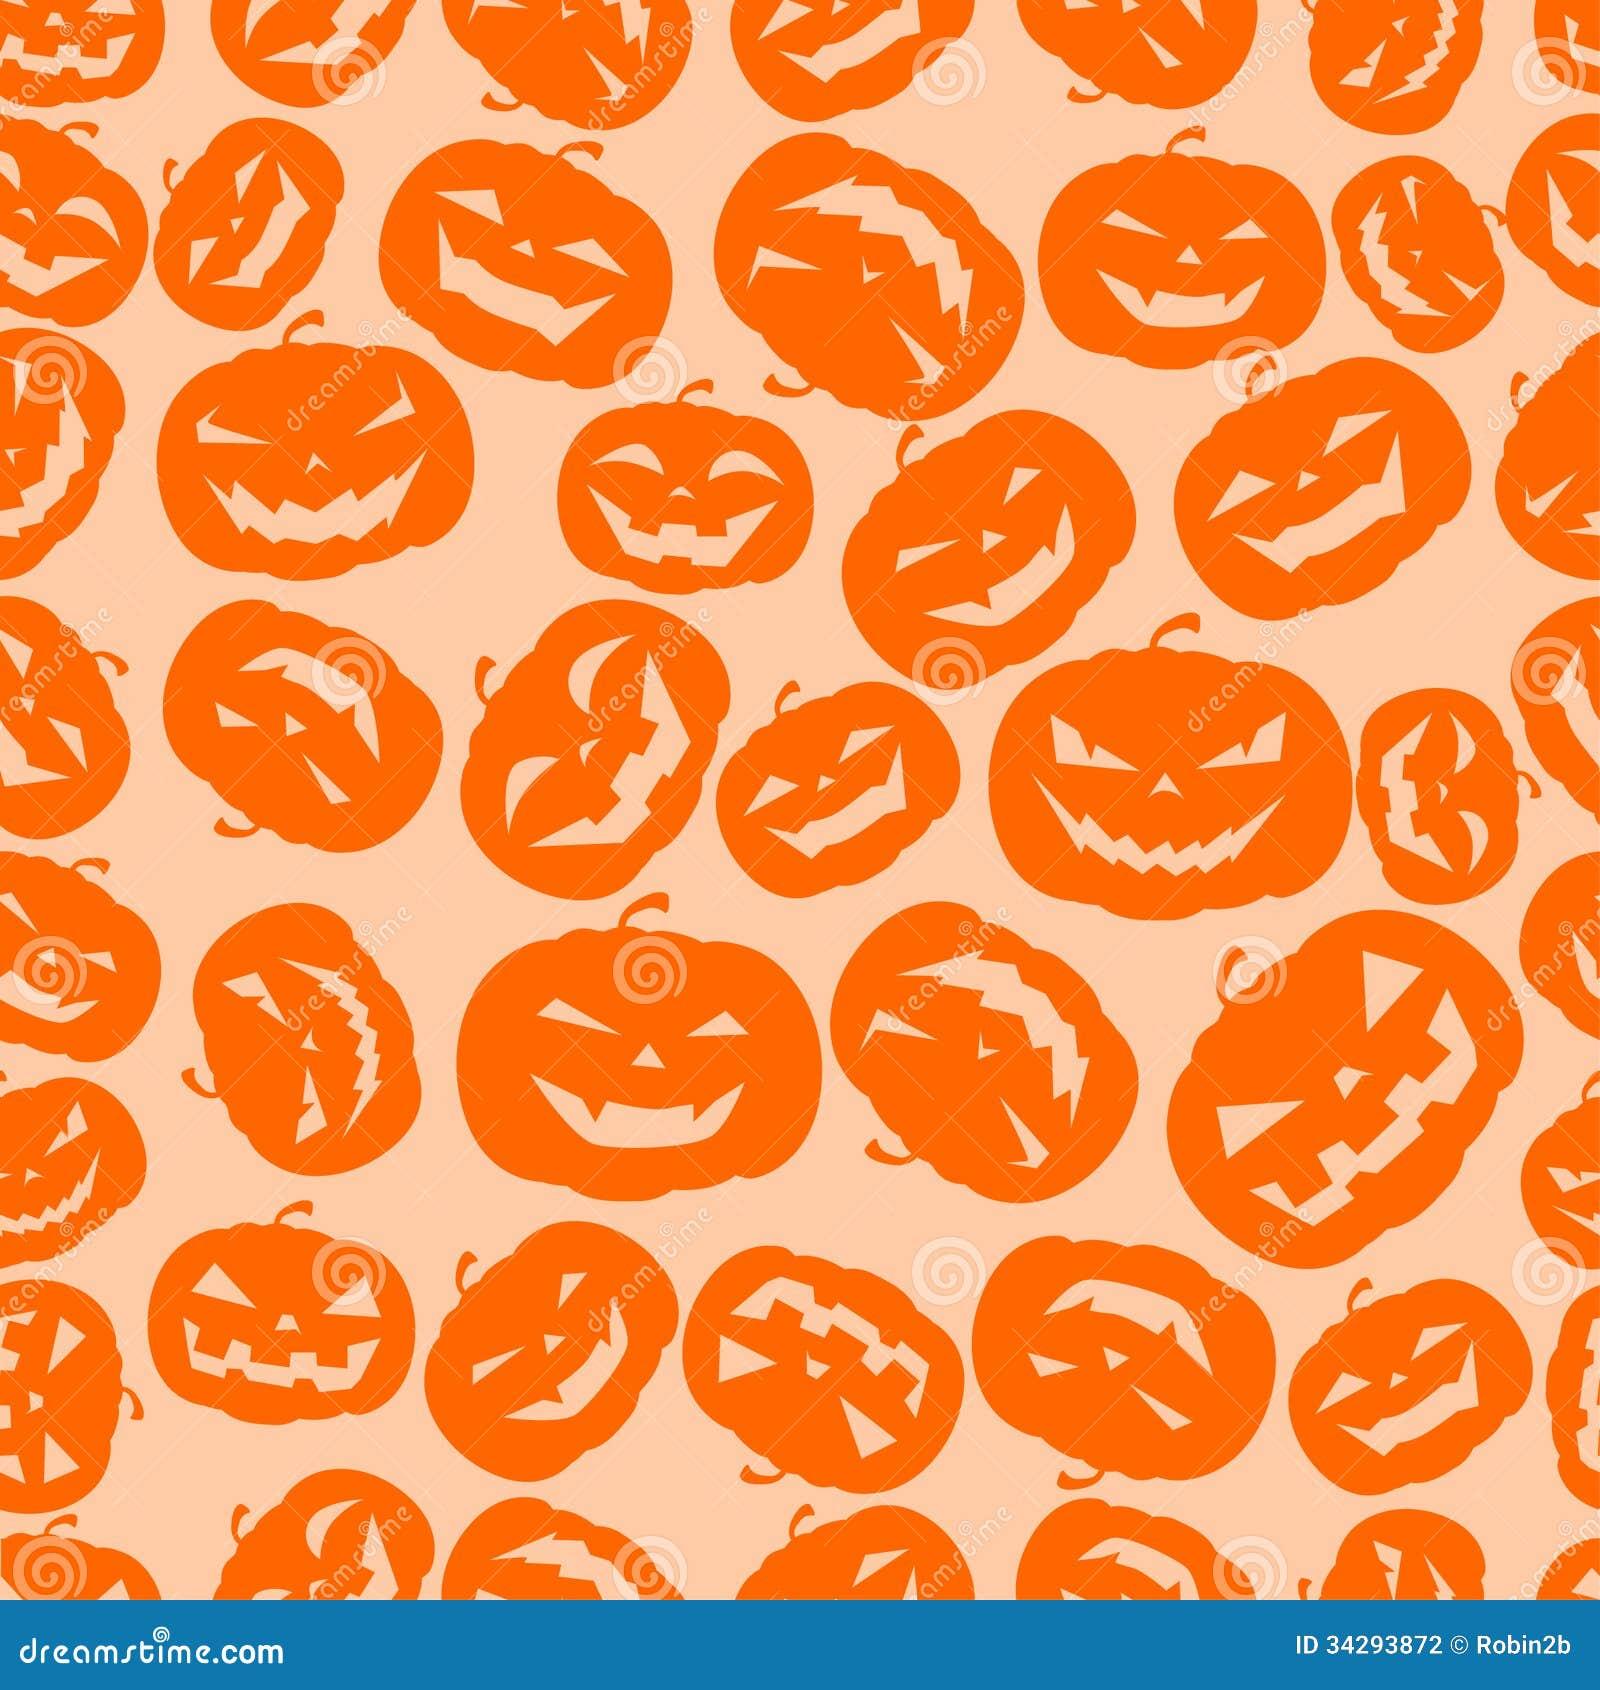 cute pumpkin pattern wallpaper